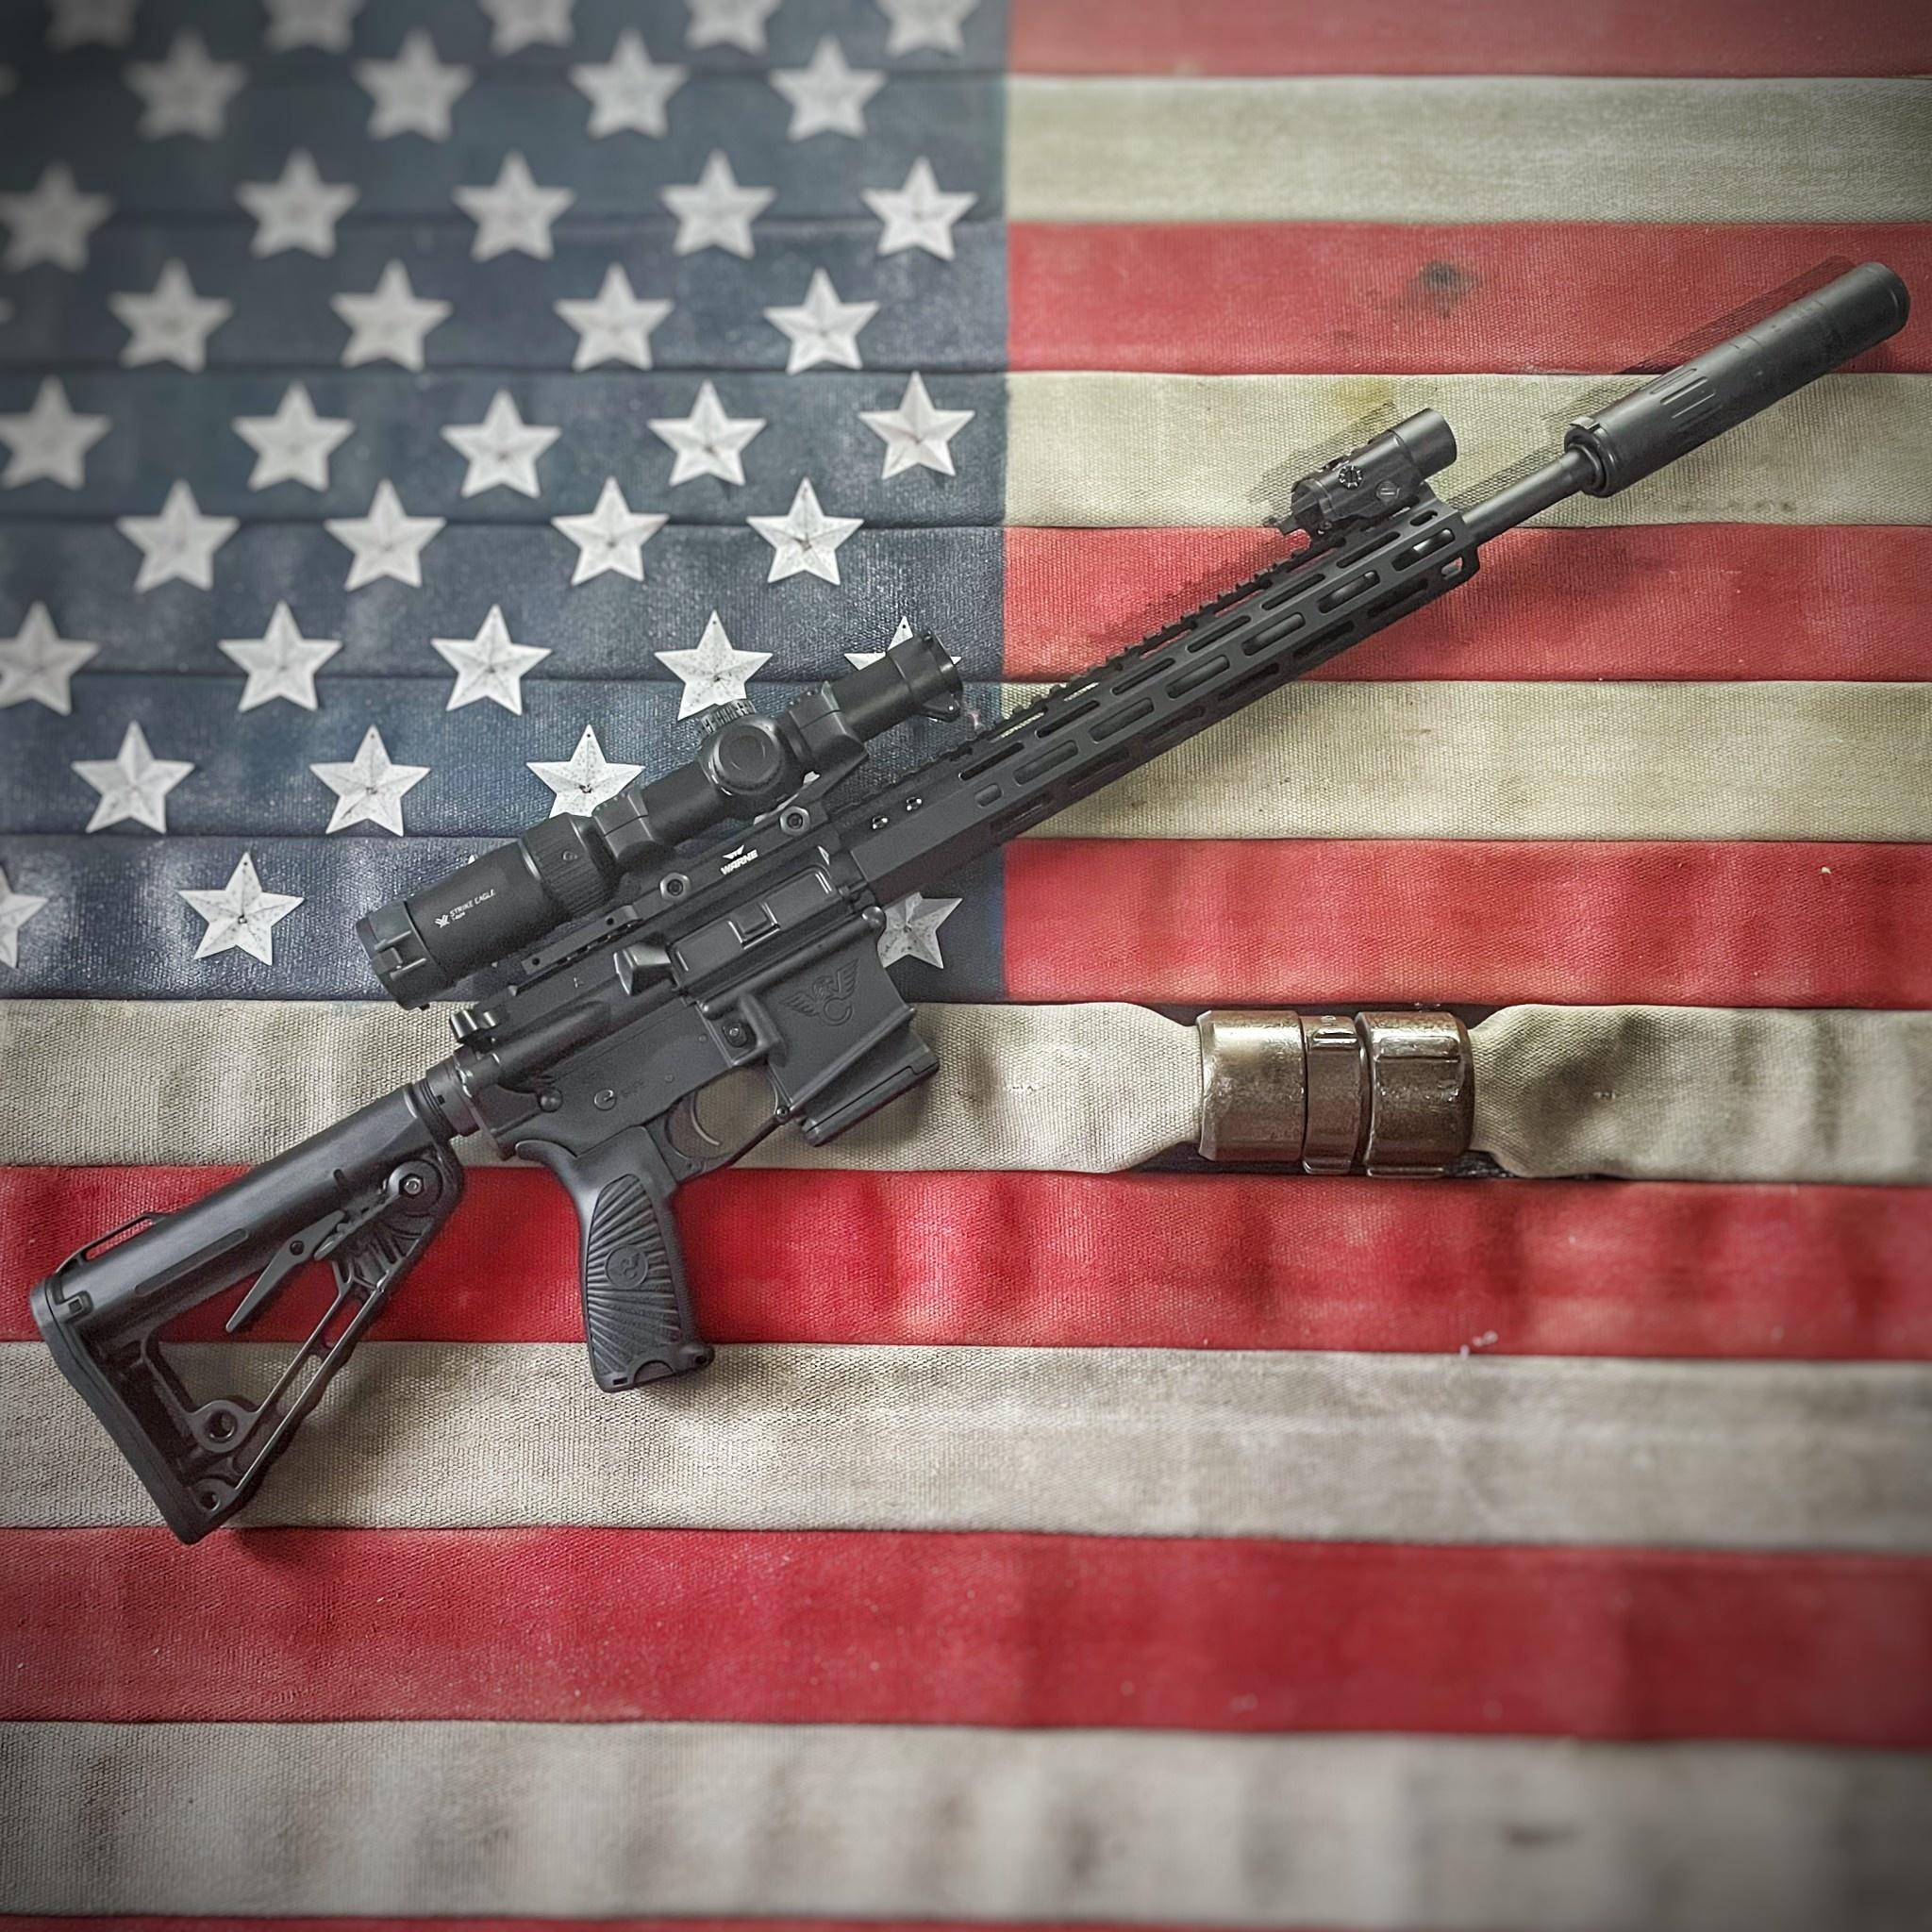 06/24 - AR-15 Rifle basics class - 6 to 7pm